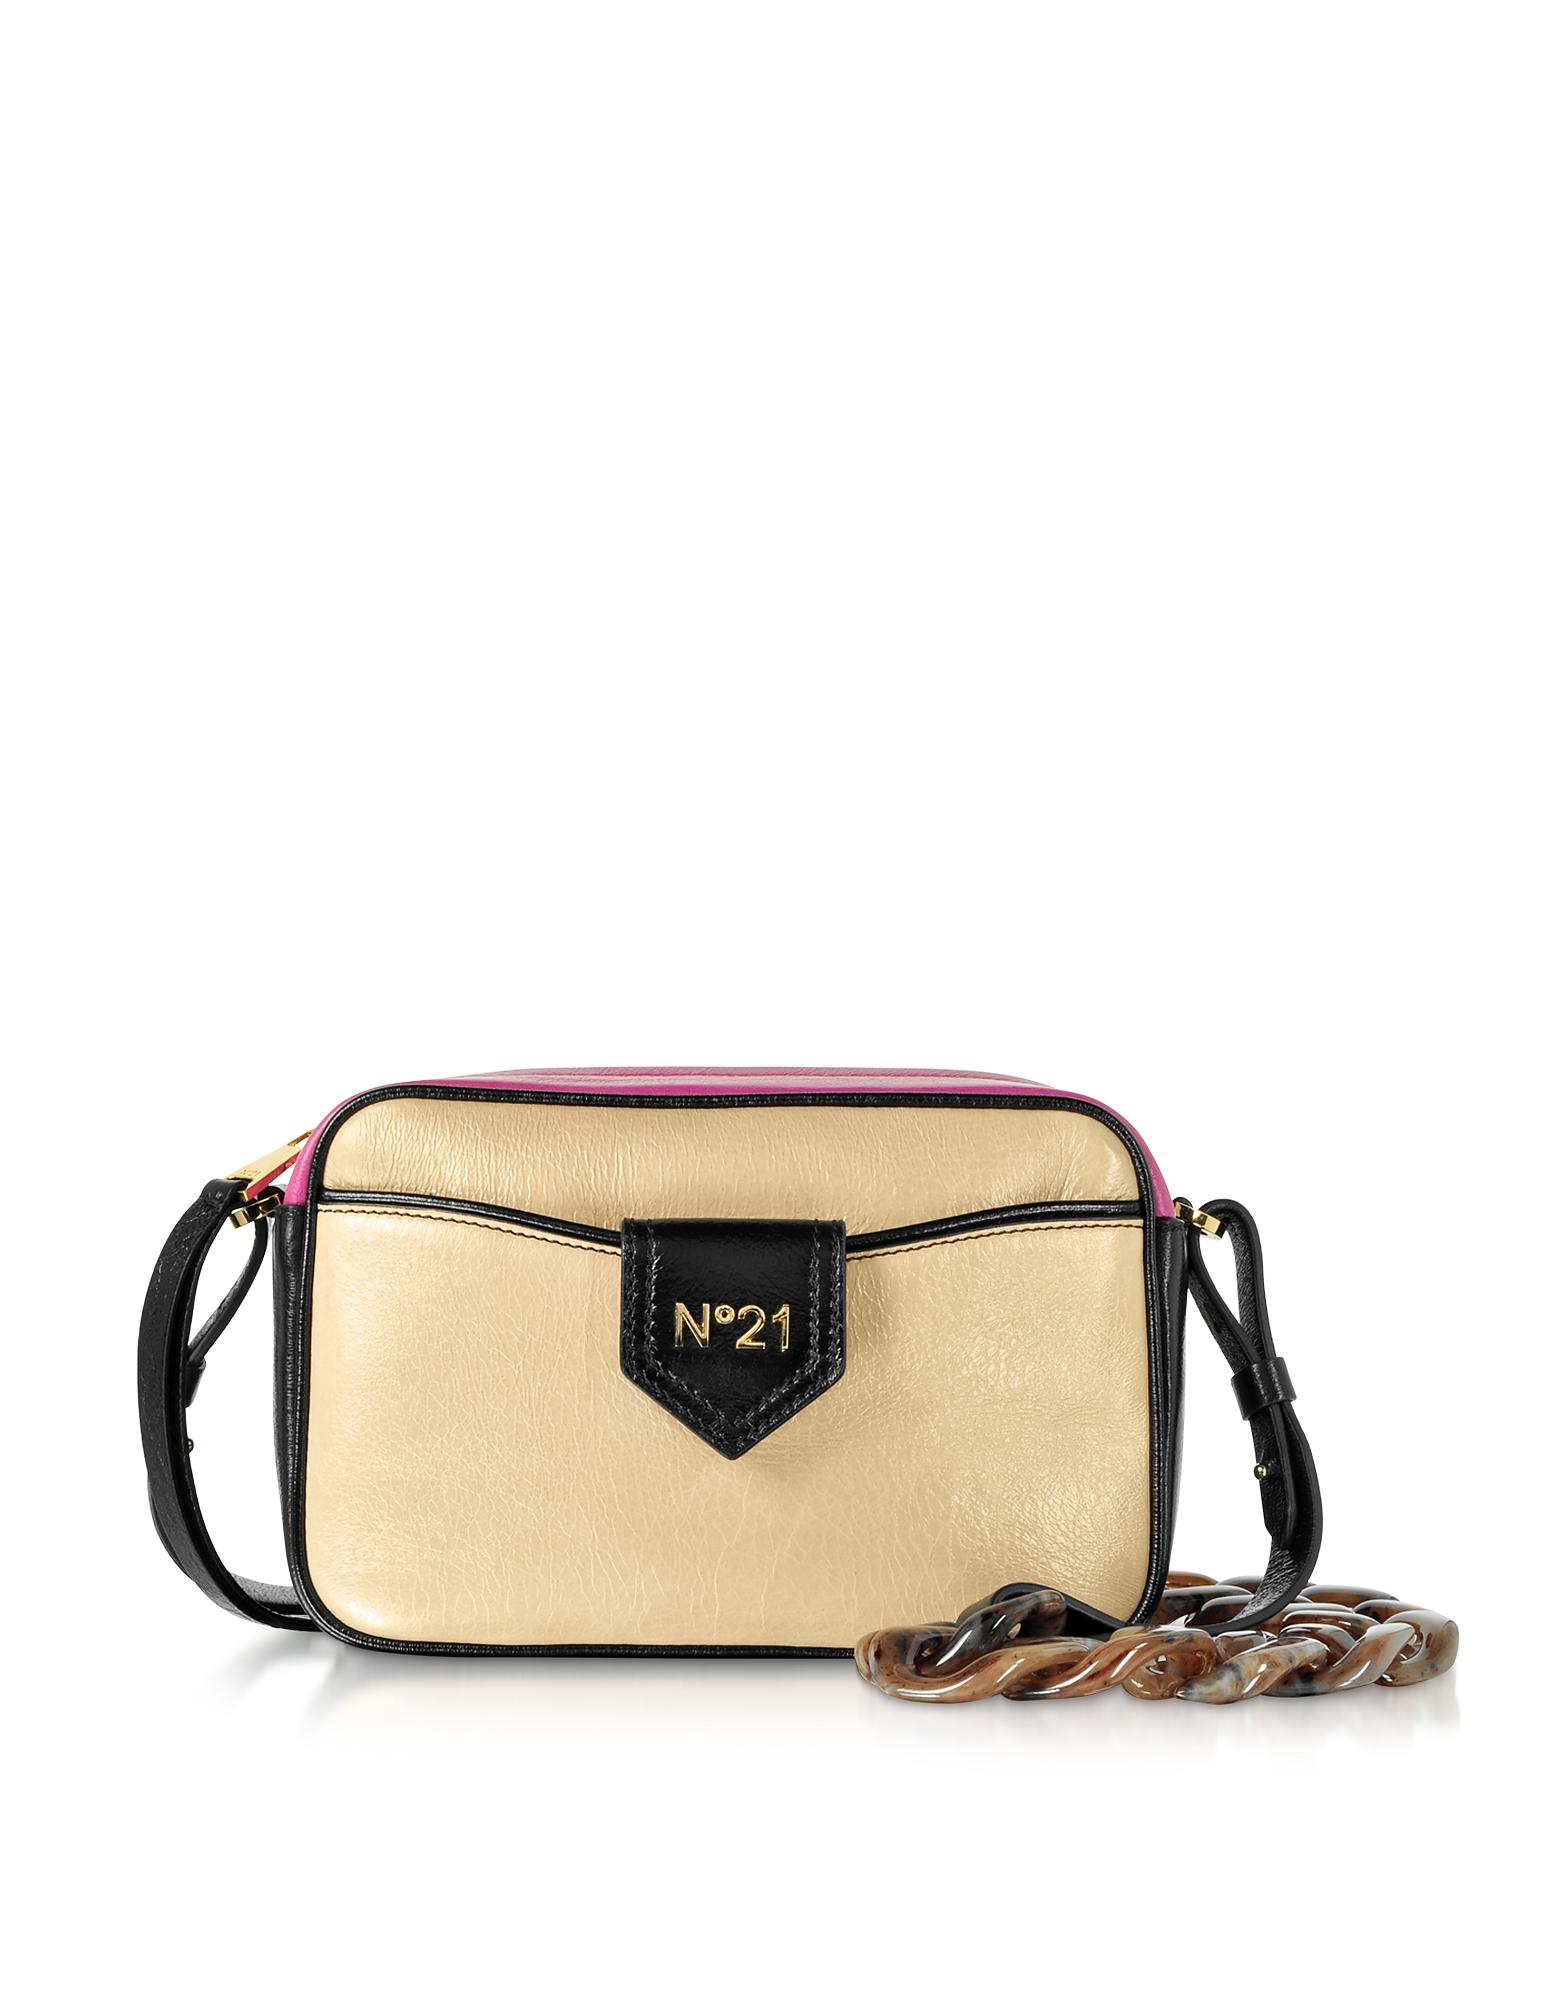 Phard, Black and Fuchsia Leather Camera Bag